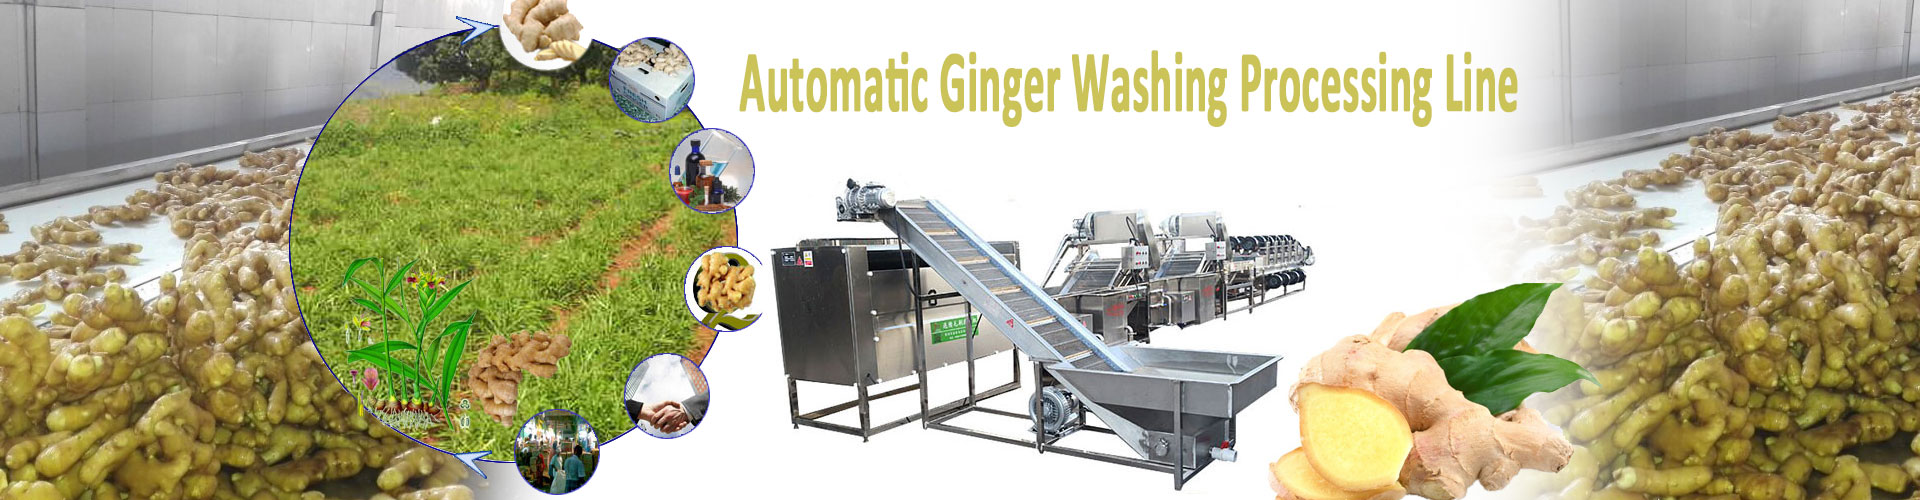 3ginger washing processing line